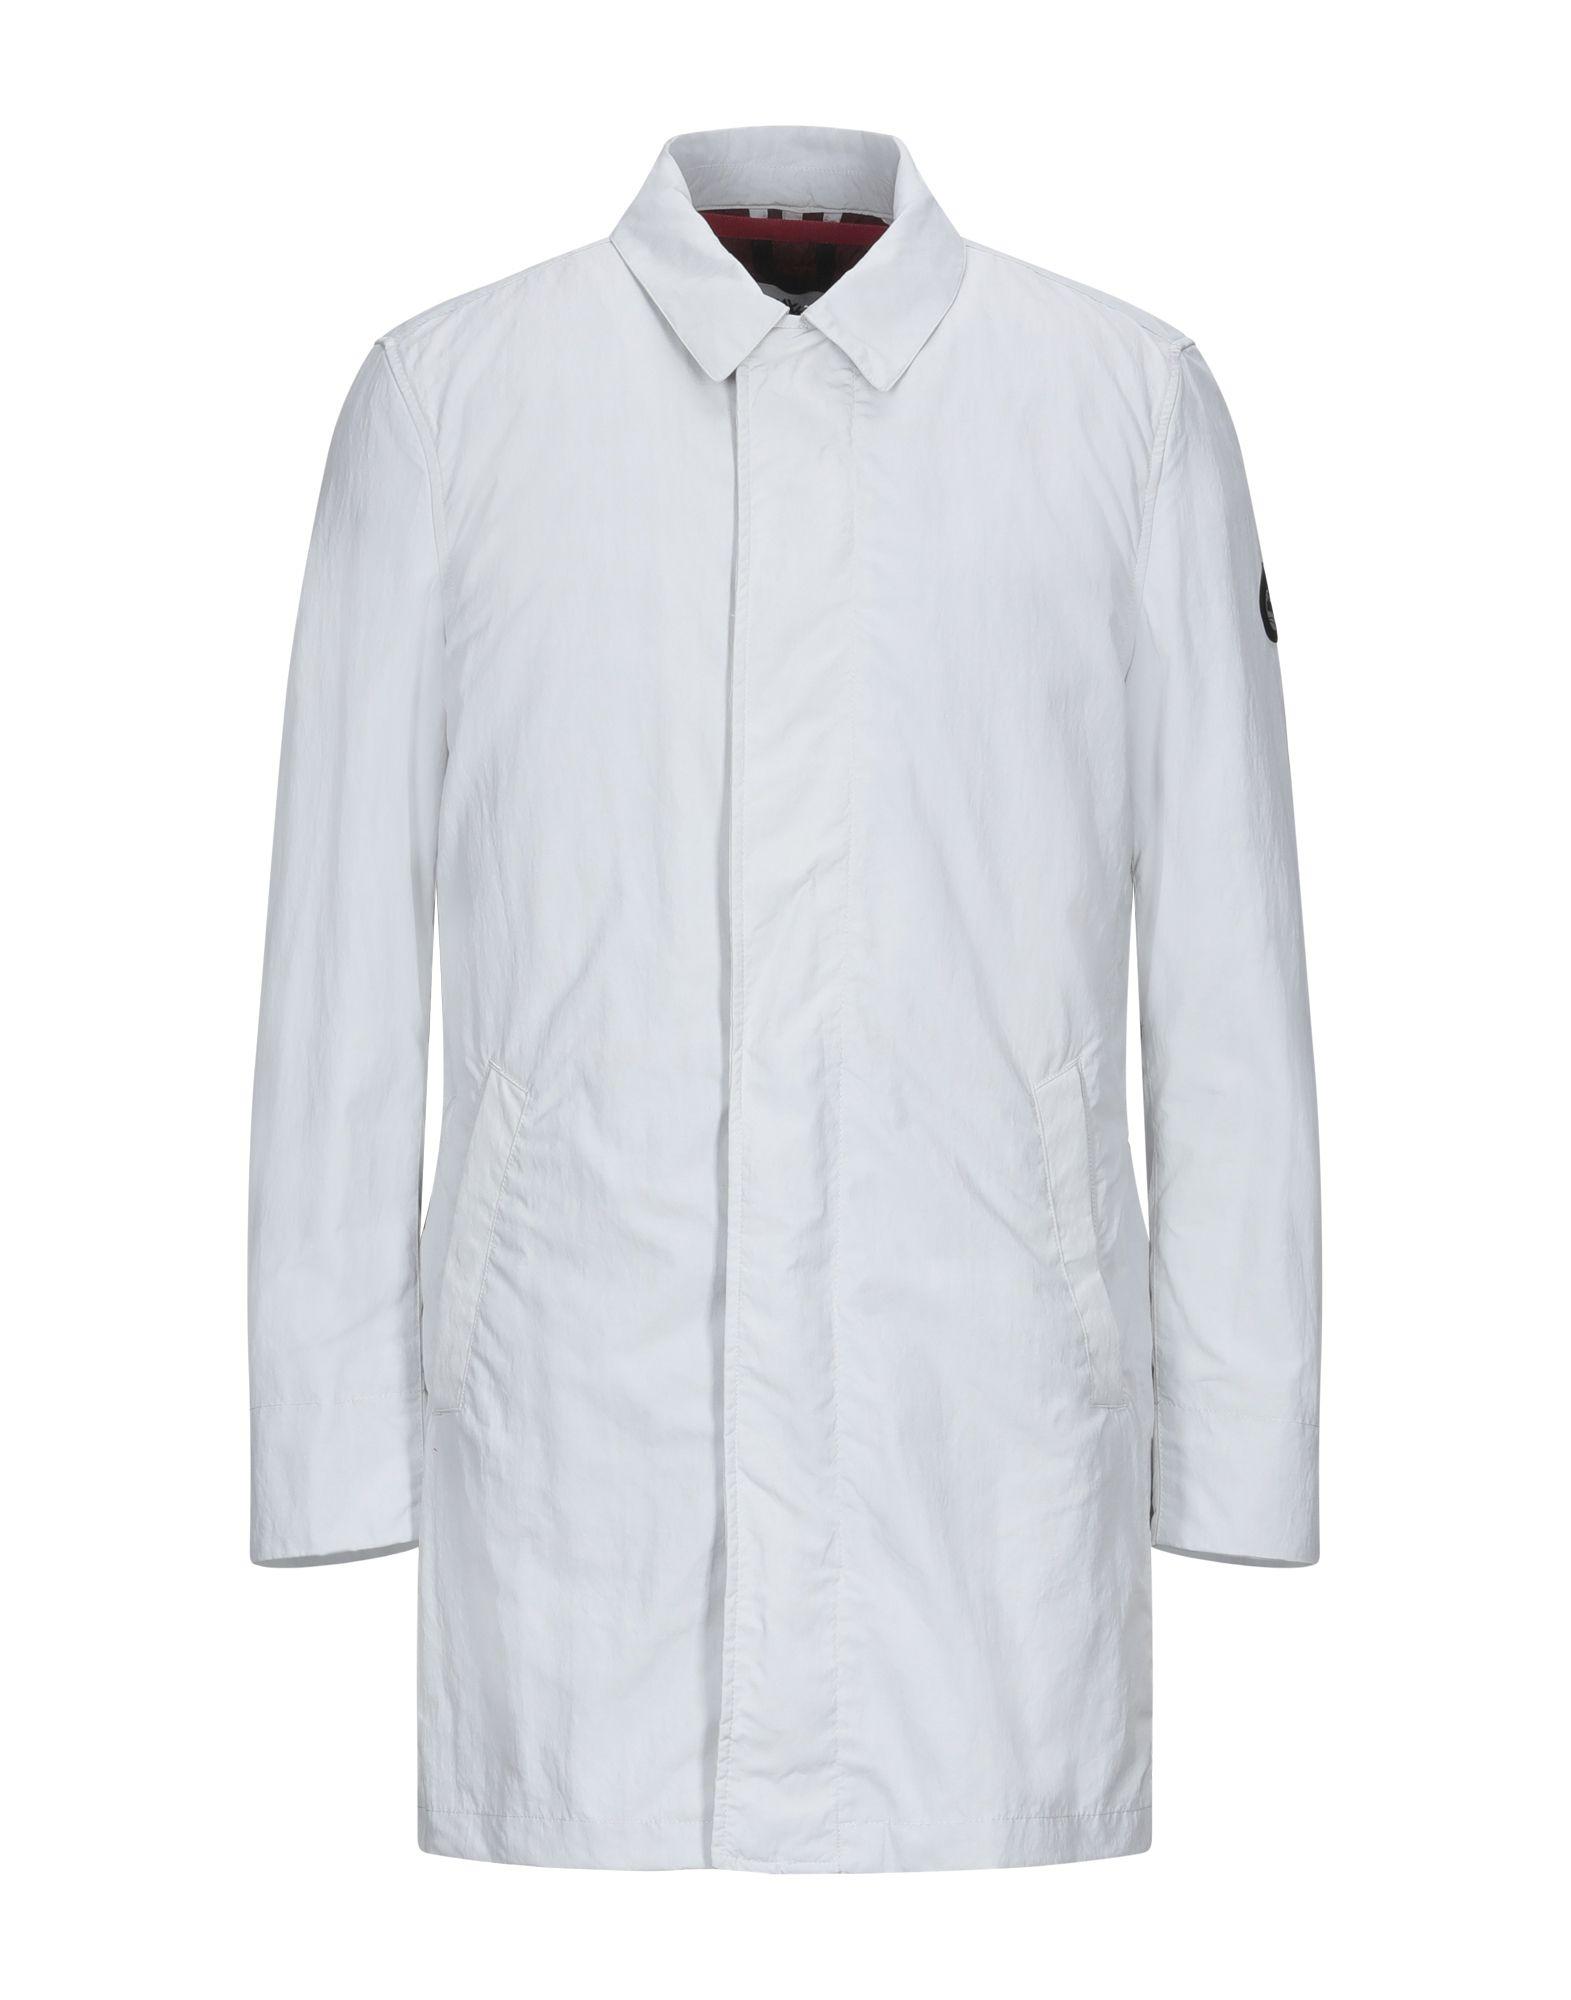 TIMBERLAND Overcoats - Item 41991827